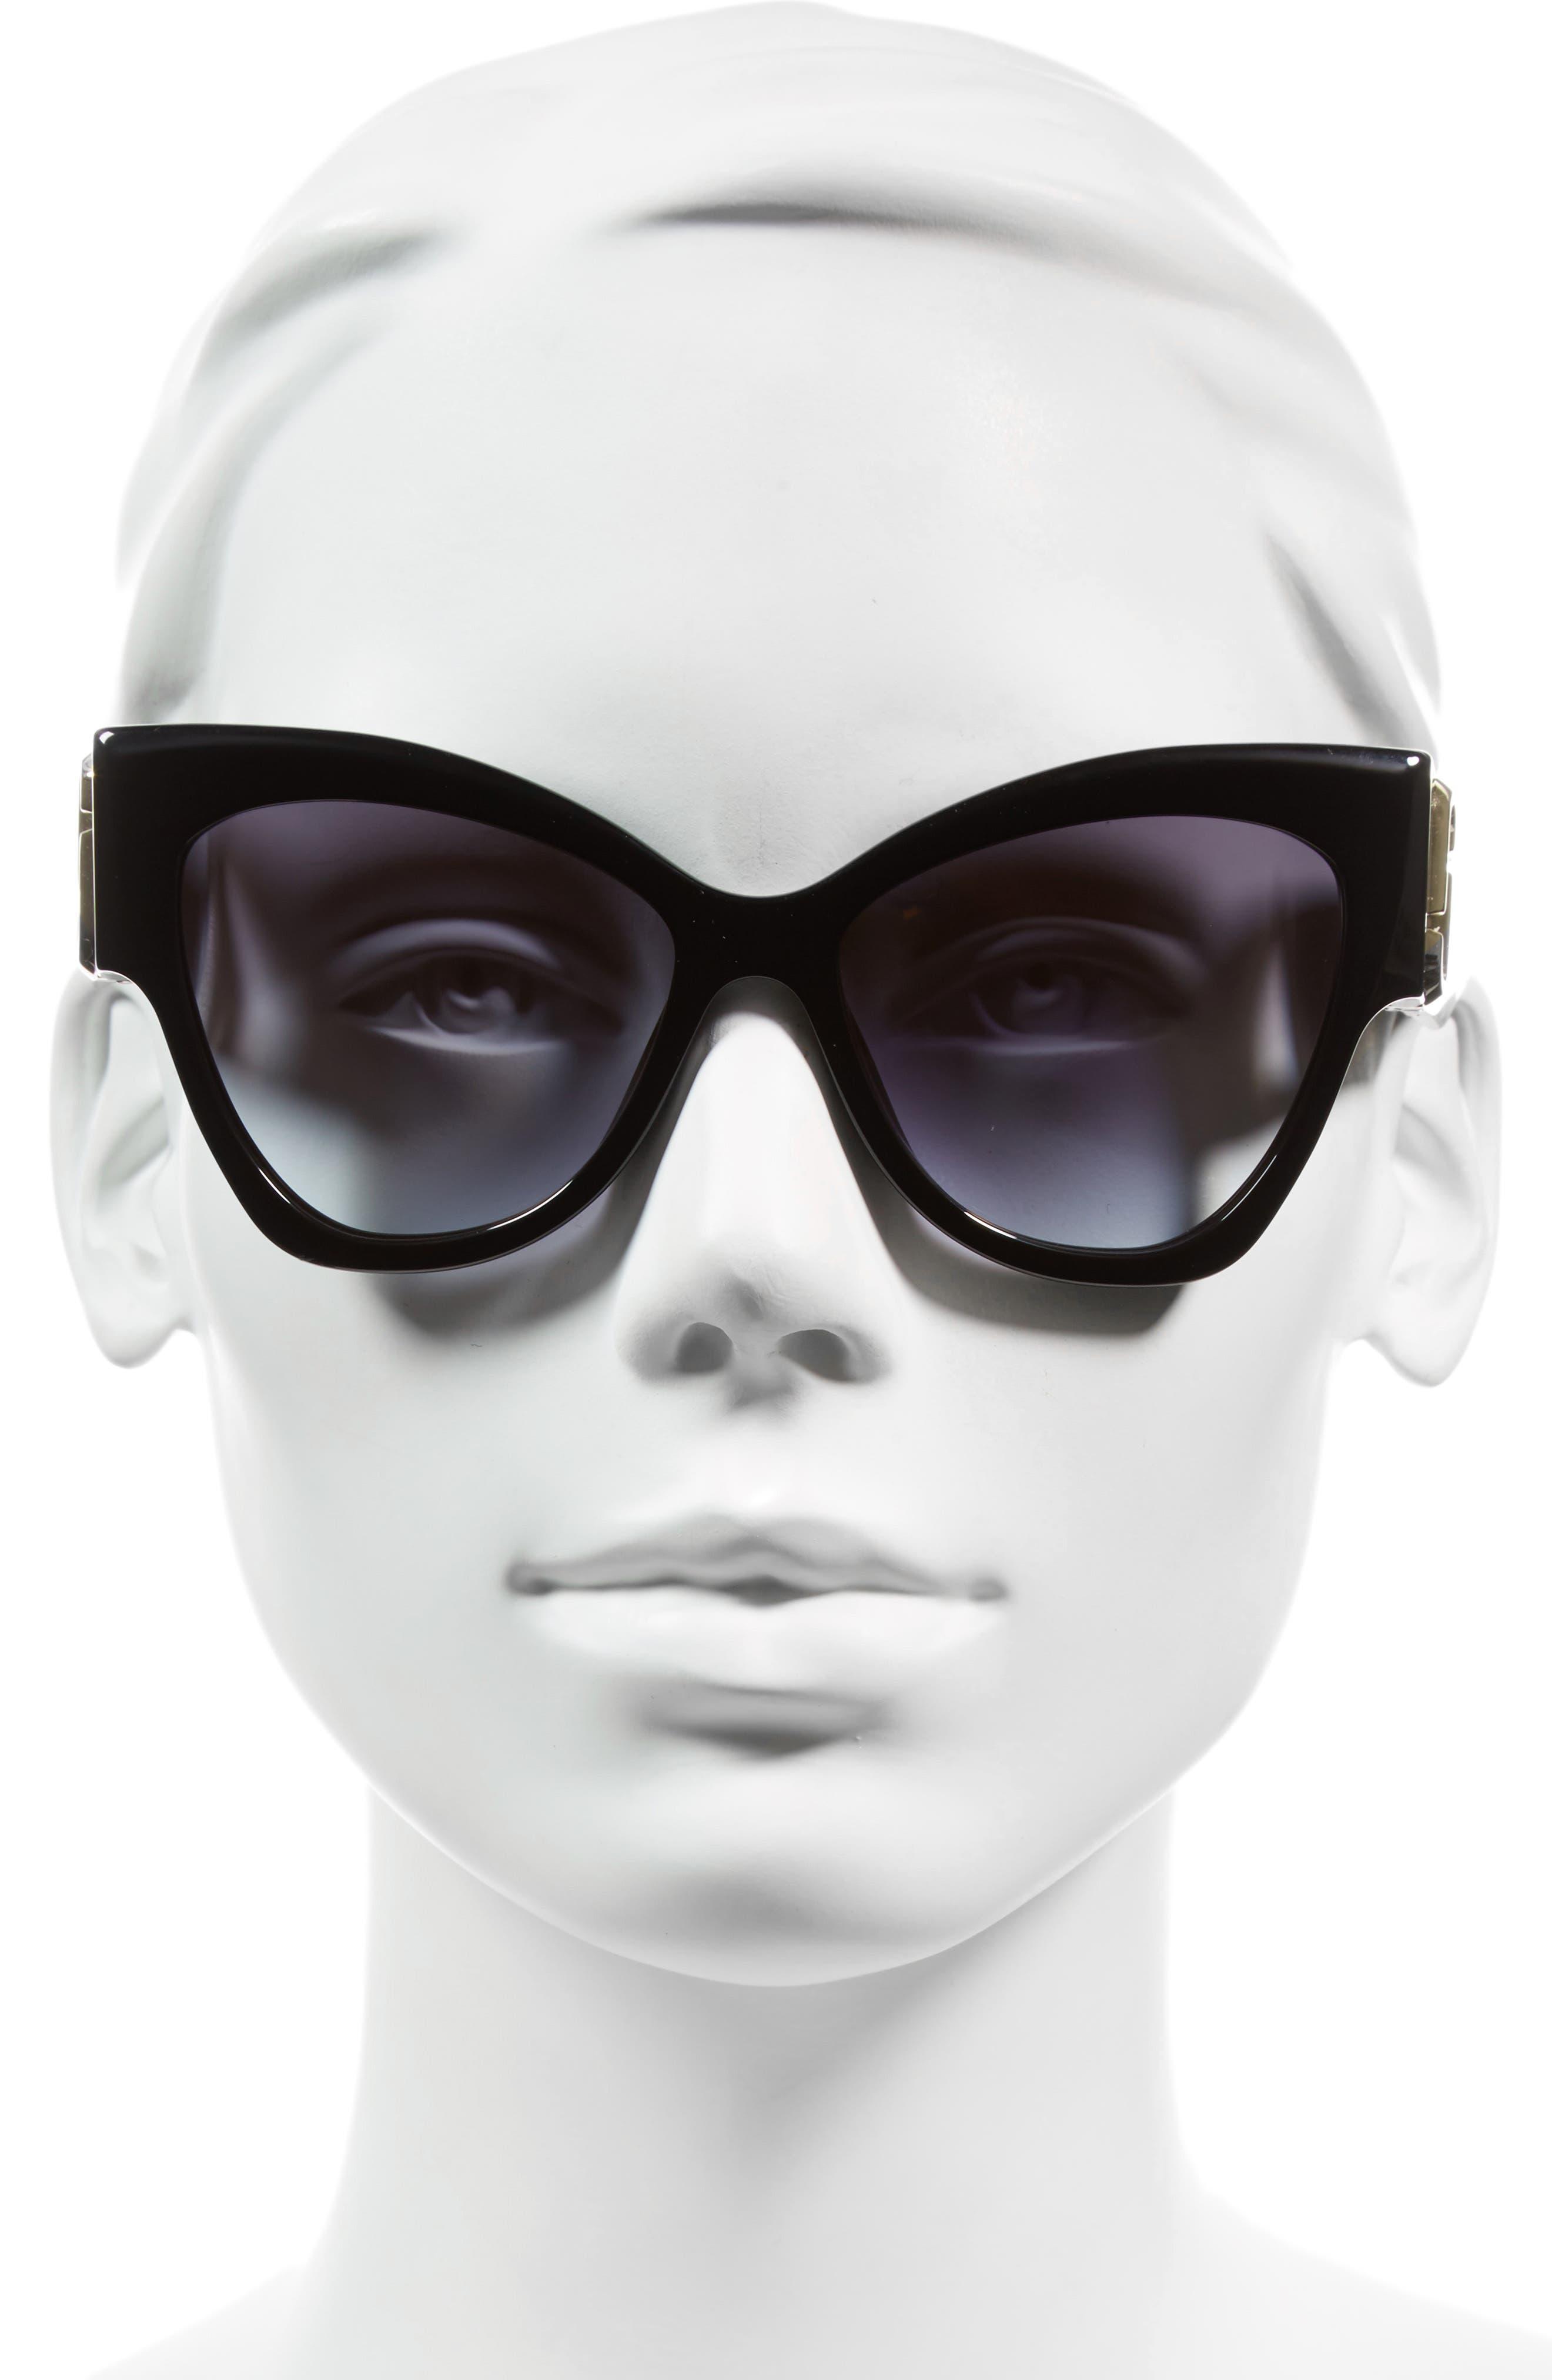 54mm Oversized Sunglasses,                             Alternate thumbnail 3, color,                             002